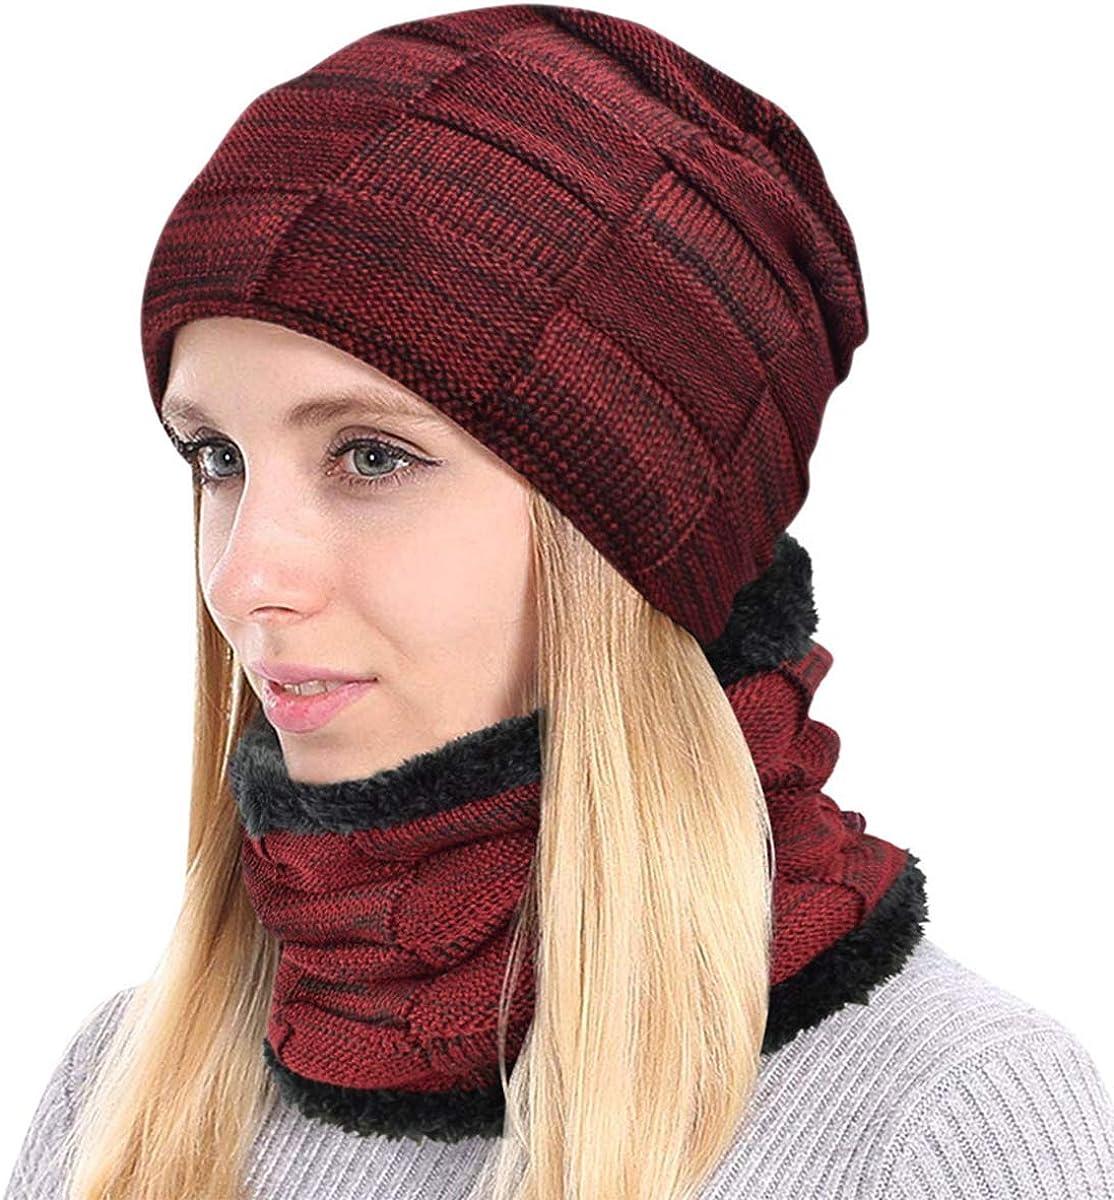 heekpek Winter Warm Hat Scarf Set Men Women Knitted Thick Slouchy Beanie Cap Fleece Lined Neck Warmer Windproof for Ski Moto Outdoor Activivities